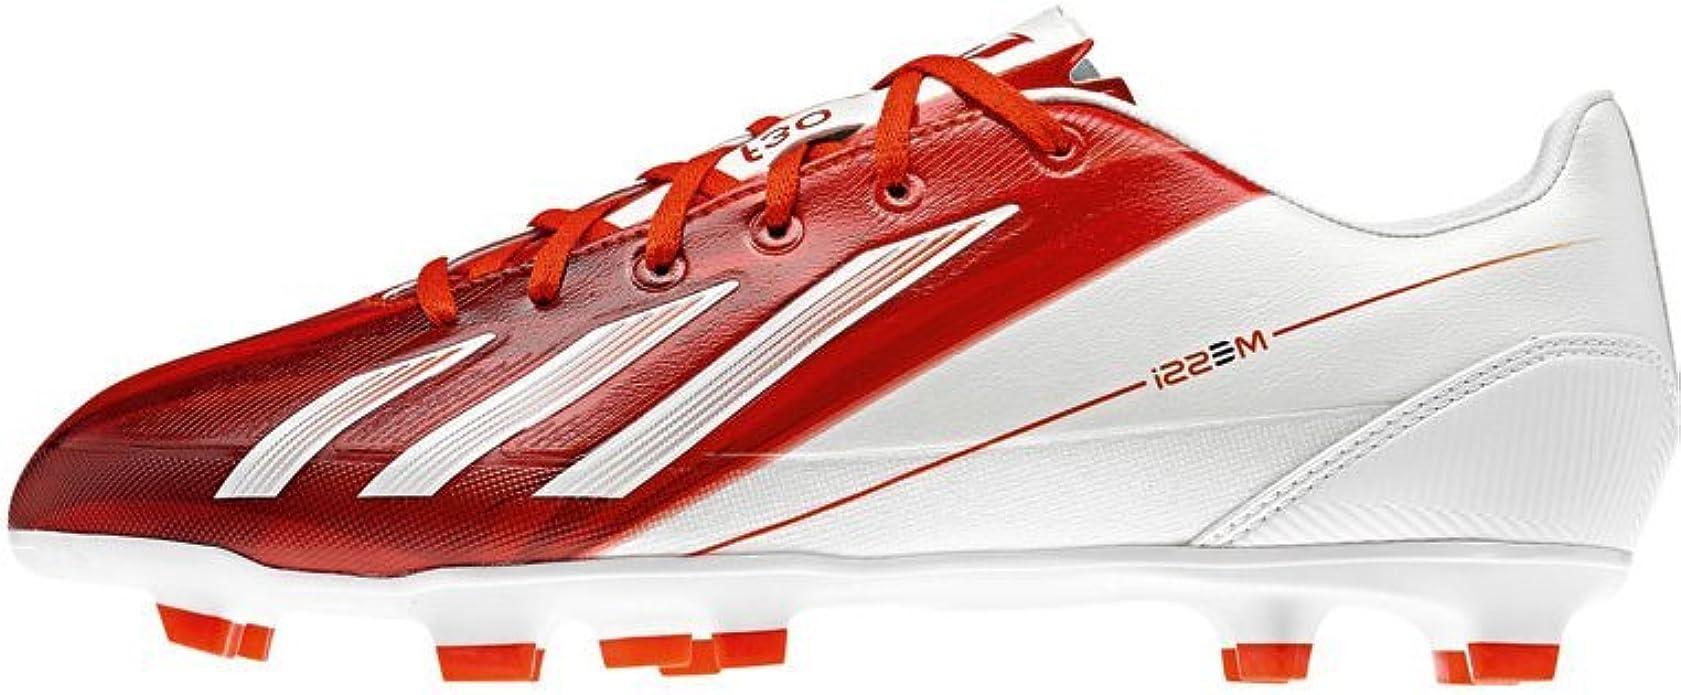 adidas F30 TRX - Botas de fútbol (Messi), Color Blanco/Negro ...